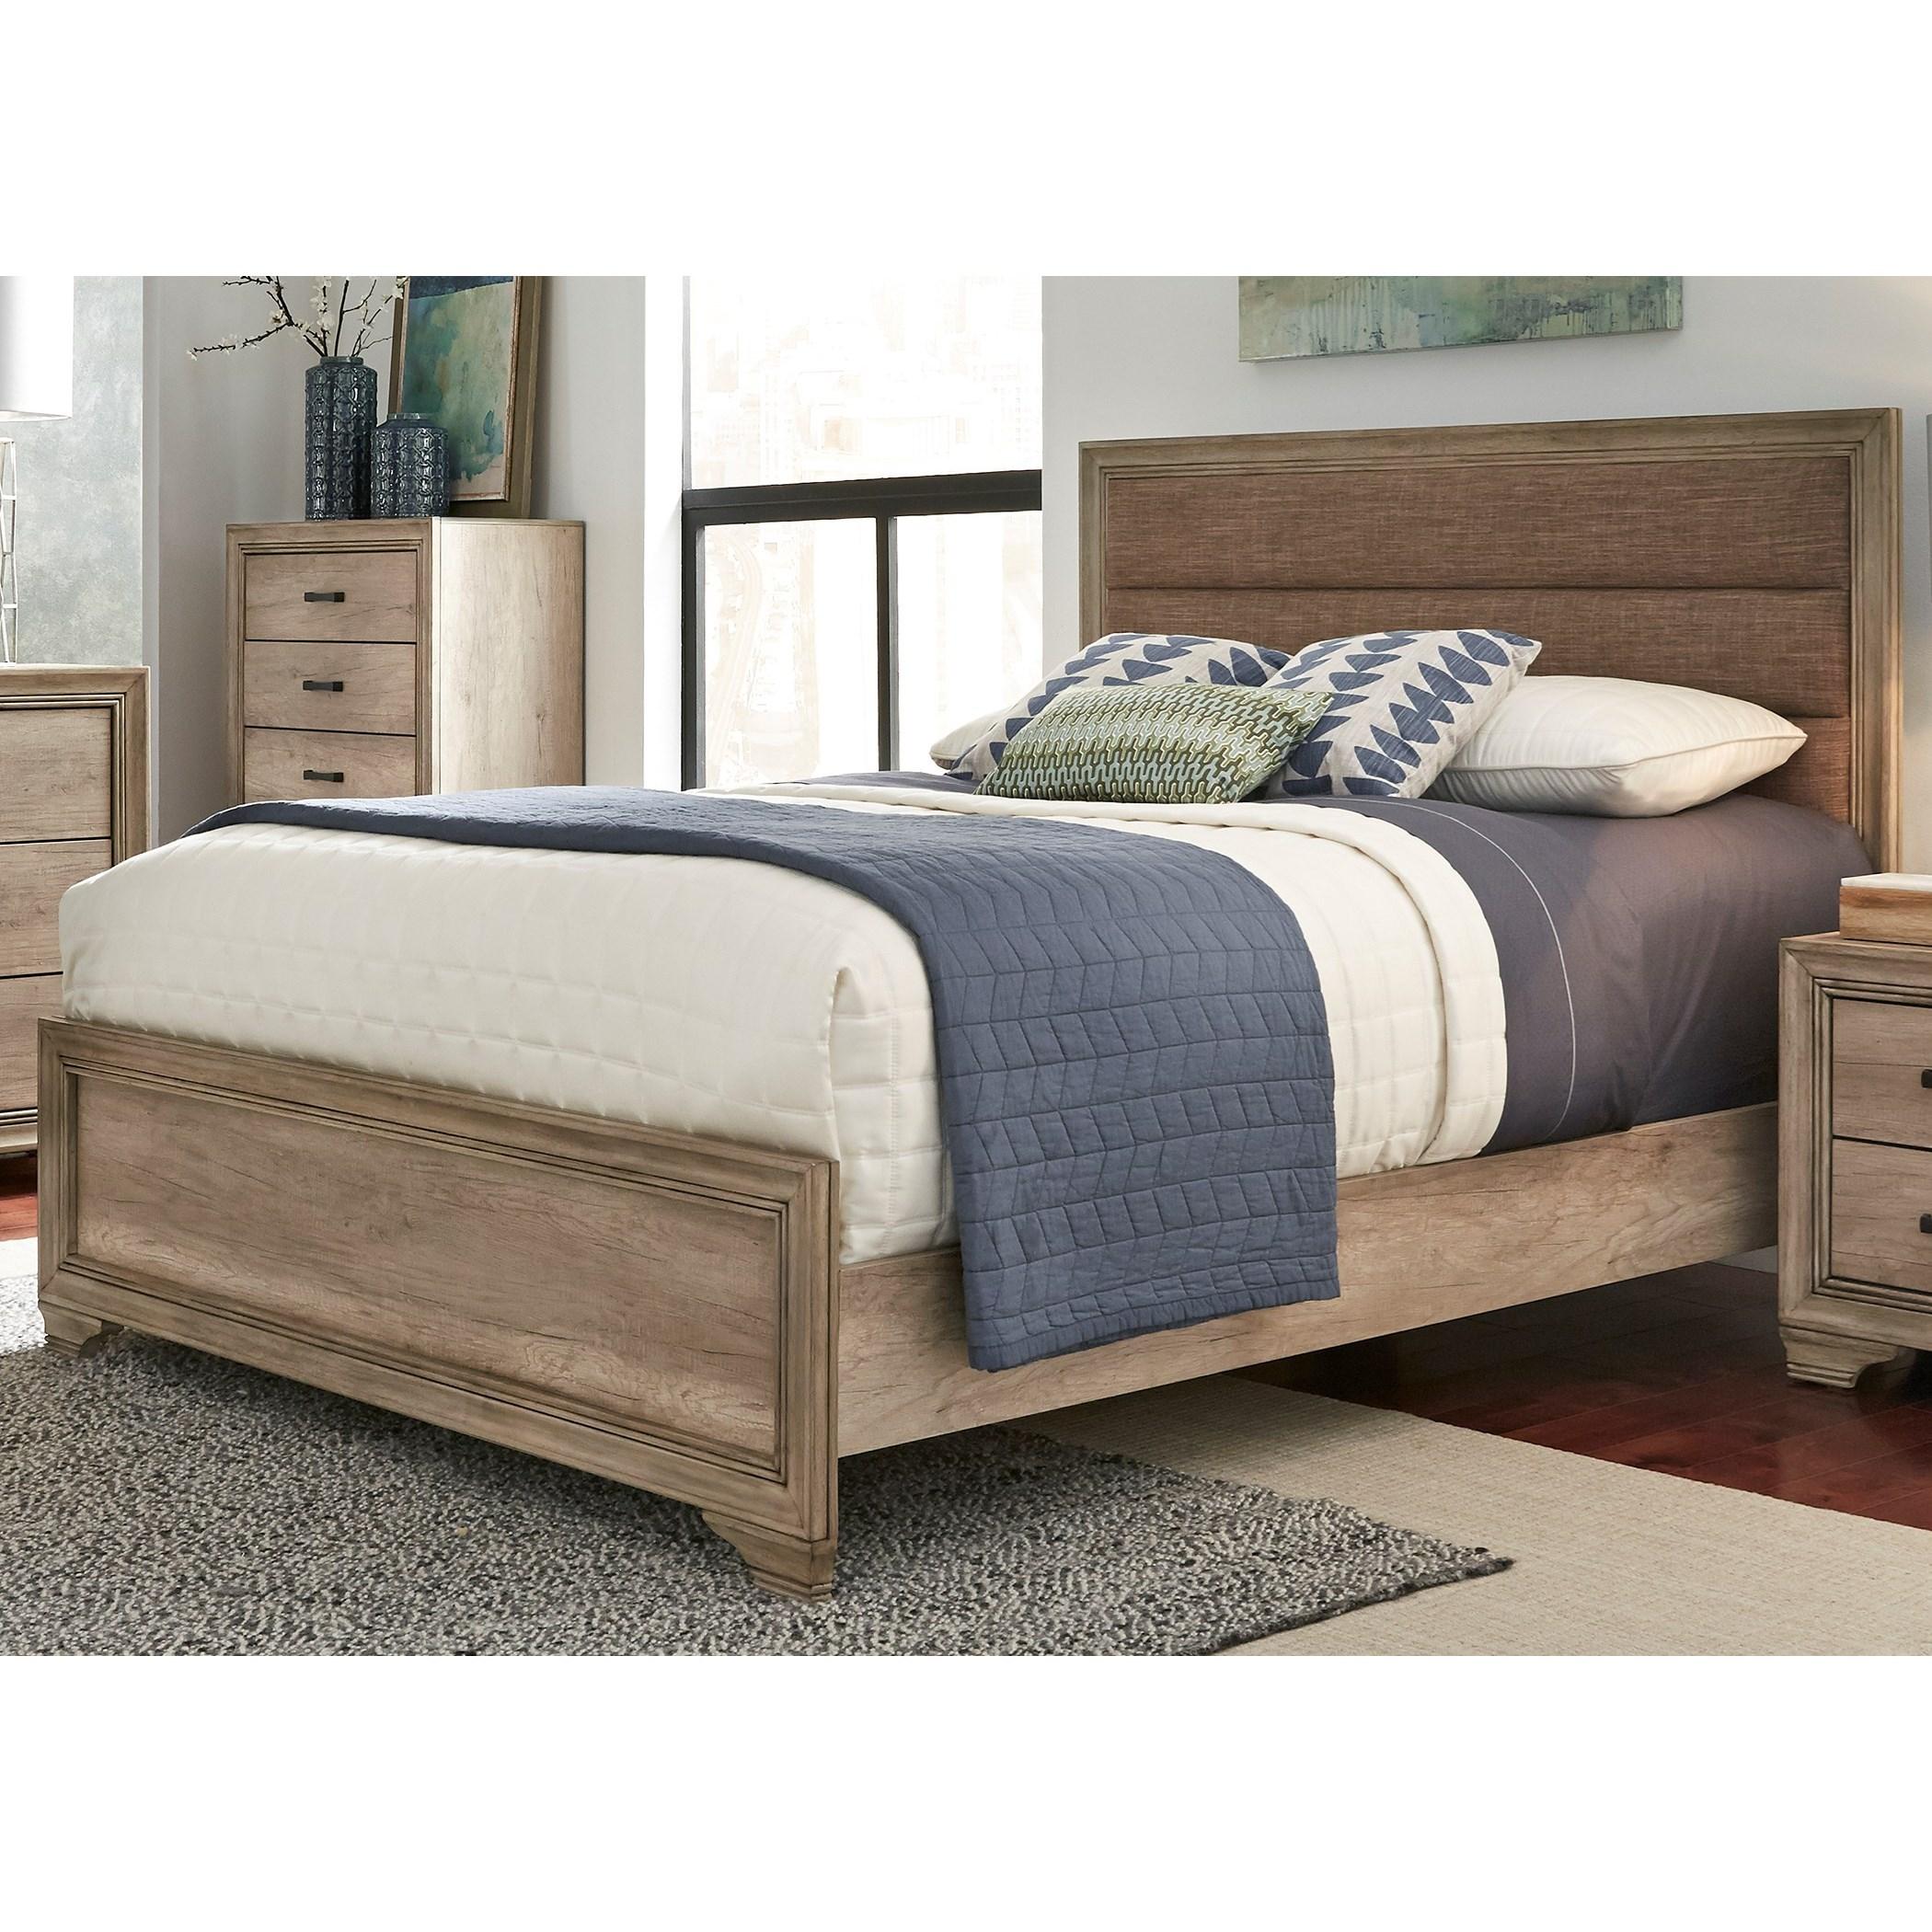 Sydney queen upholstered panel bed rotmans upholstered for Beds sydney